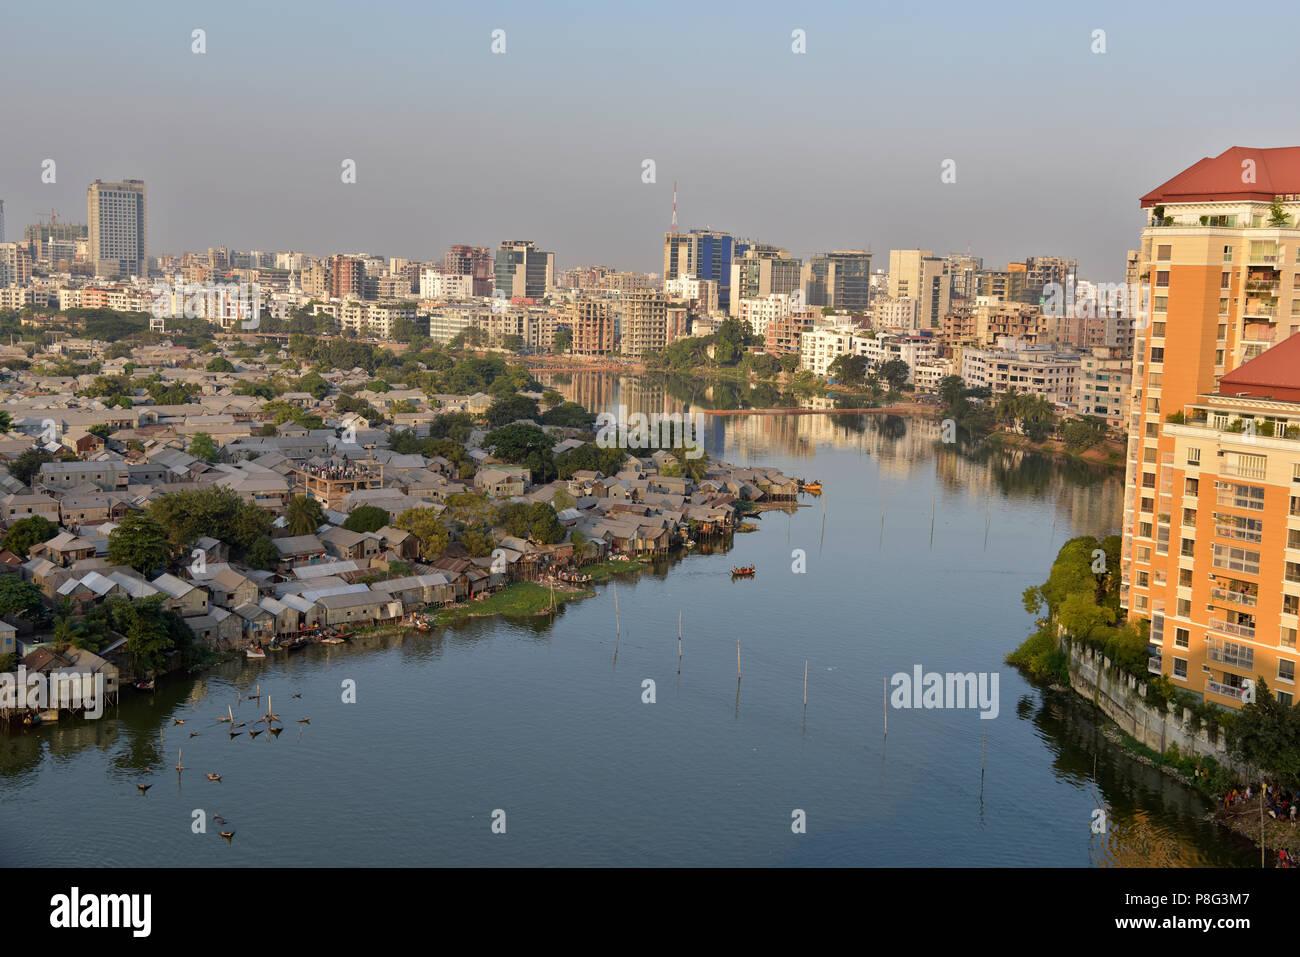 luoghi di incontri a Dhaka City siti di incontri per i professionisti neri UK